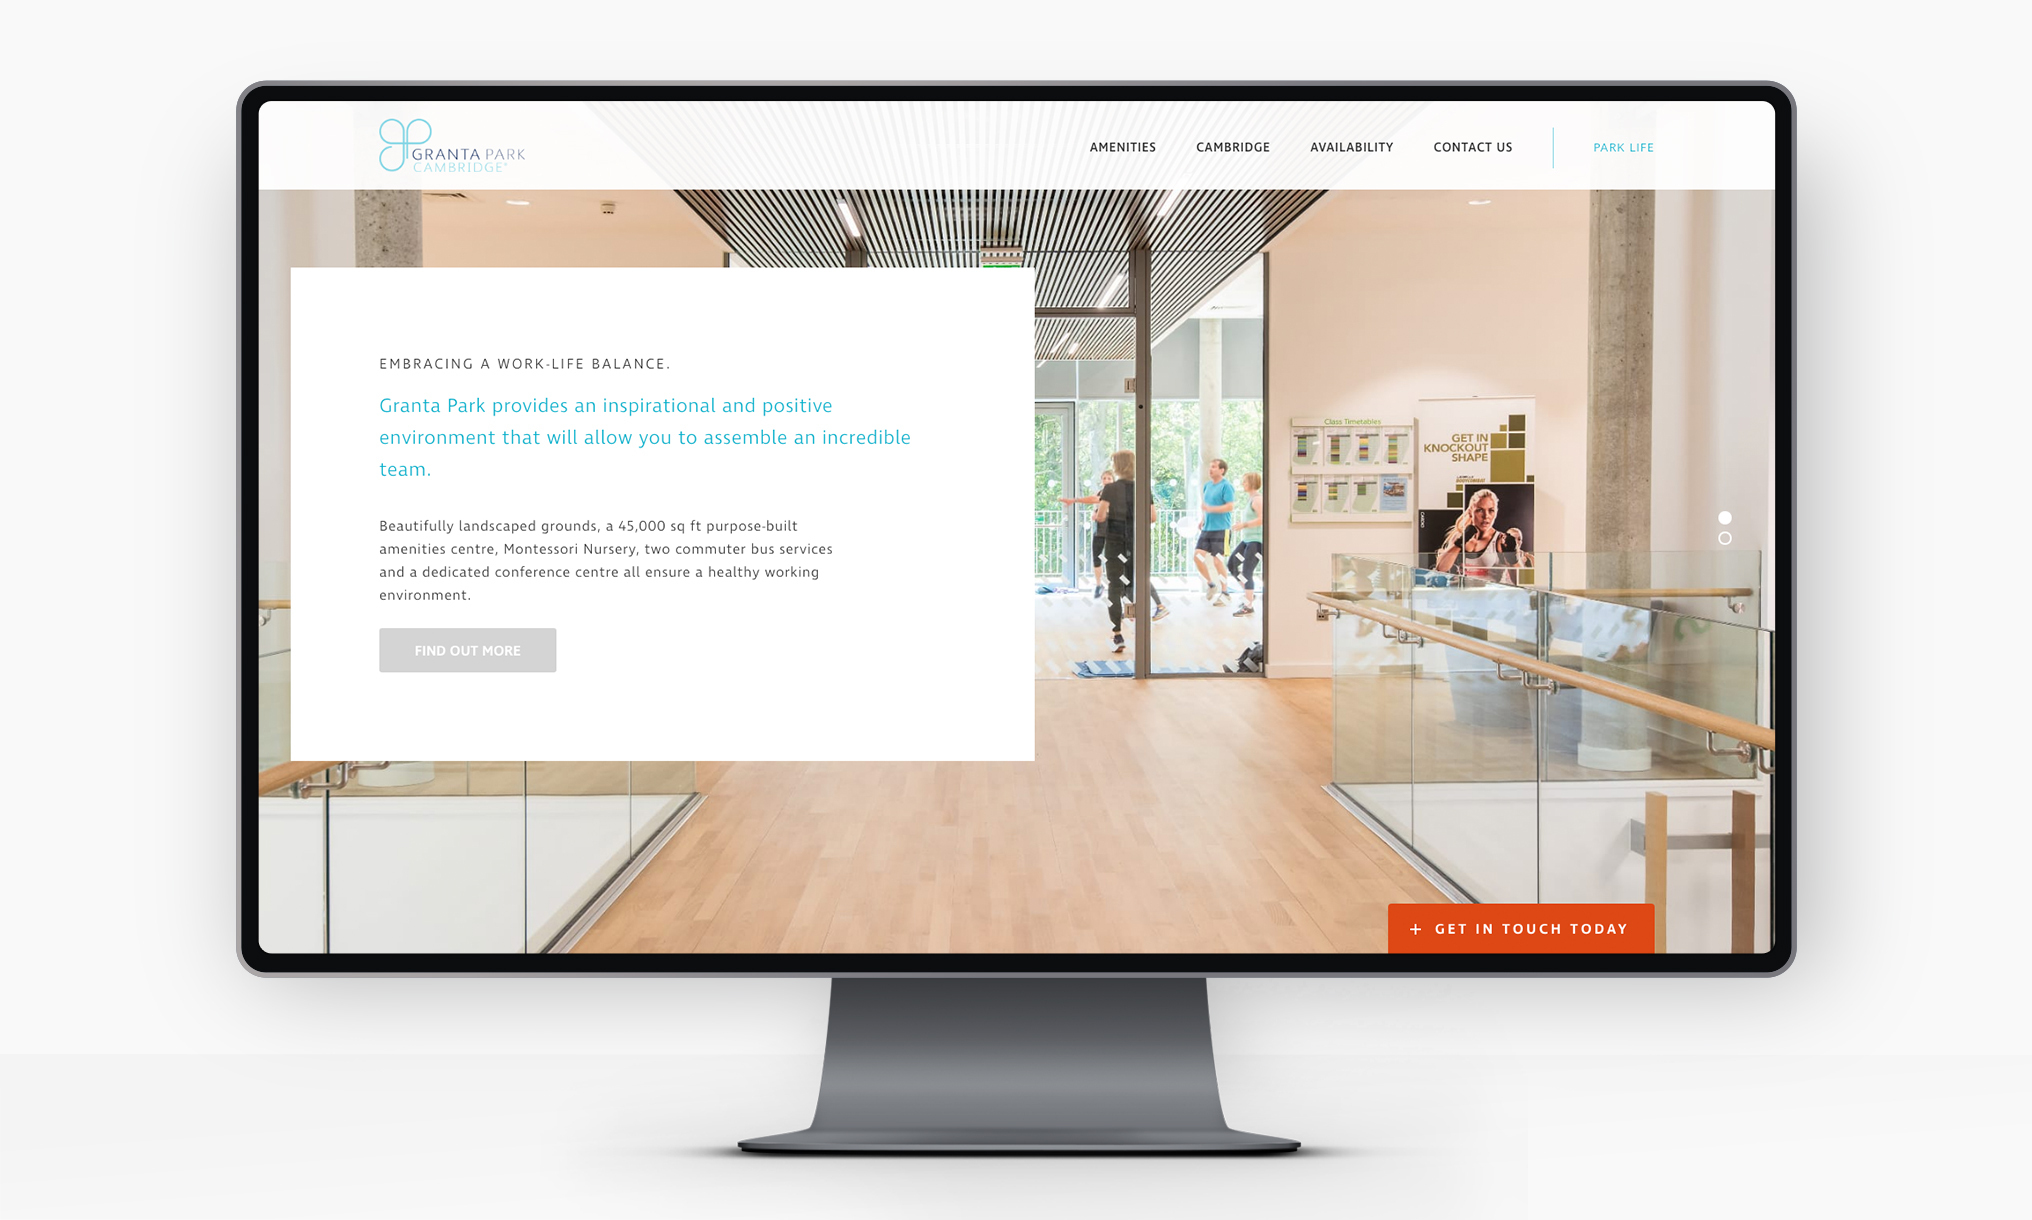 Granta-ParkGP-desktop-02